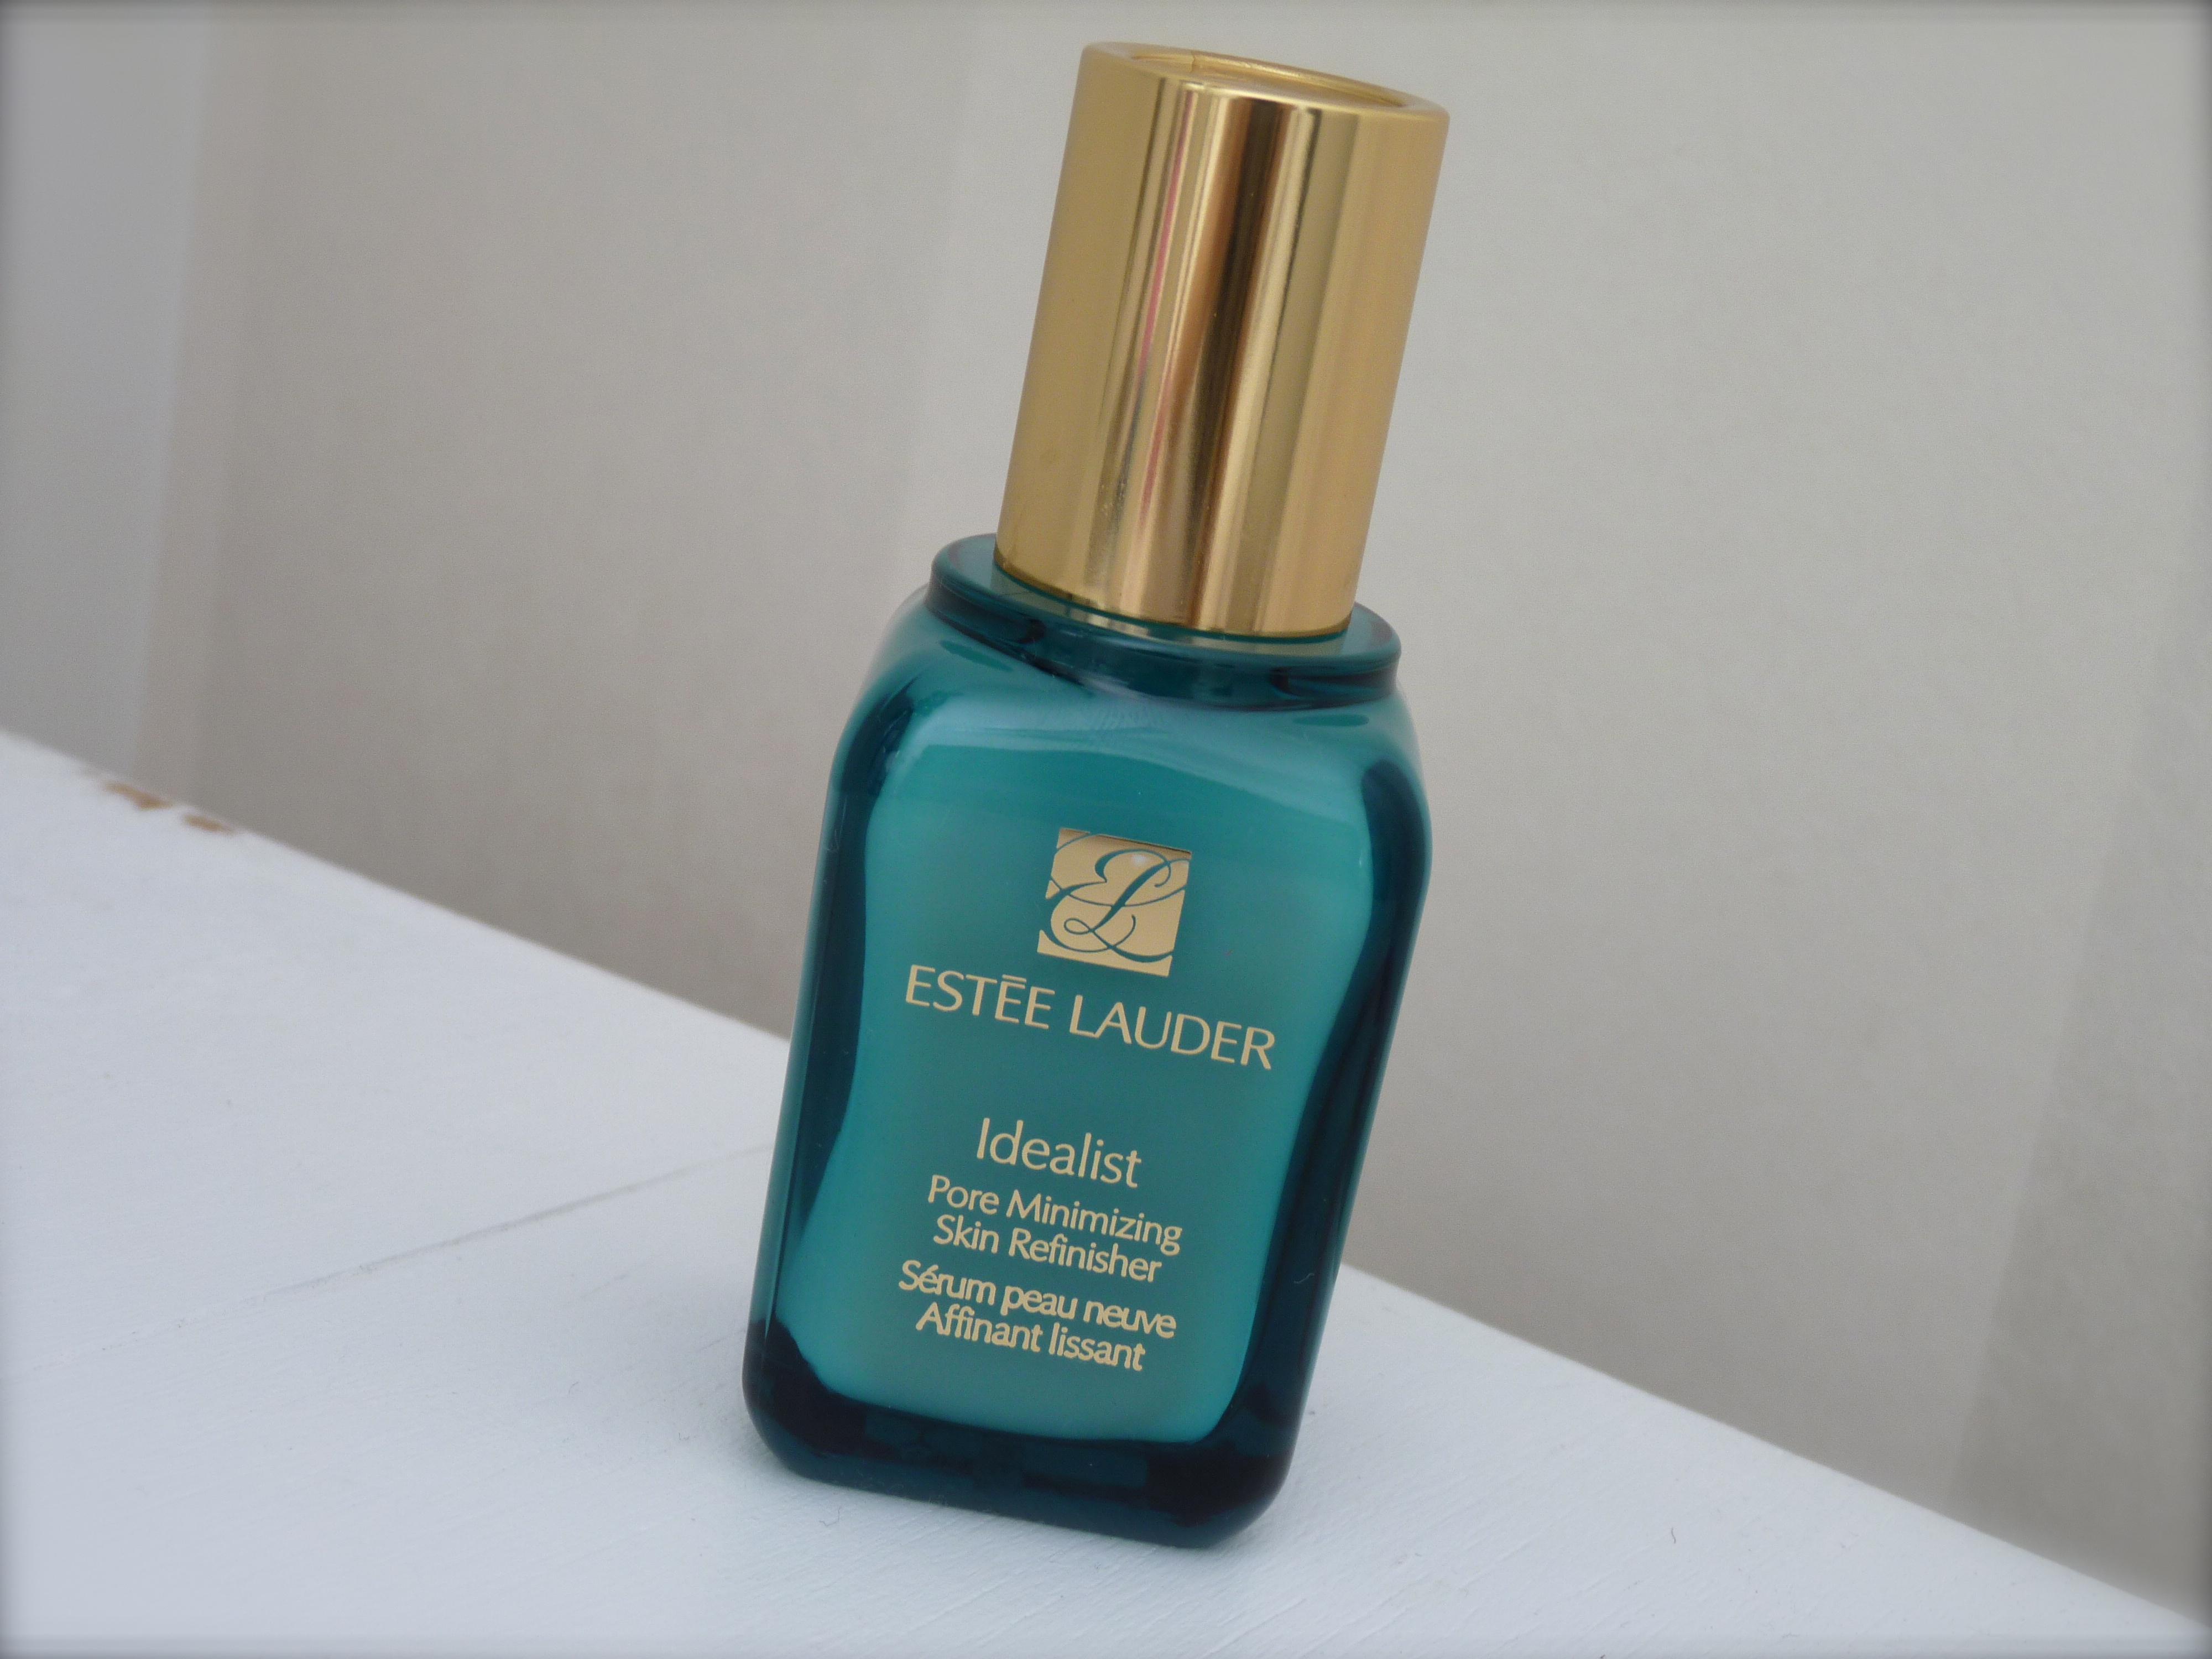 The Review Estee Lauder Idealist Pore Minimizing Skin Refinisher